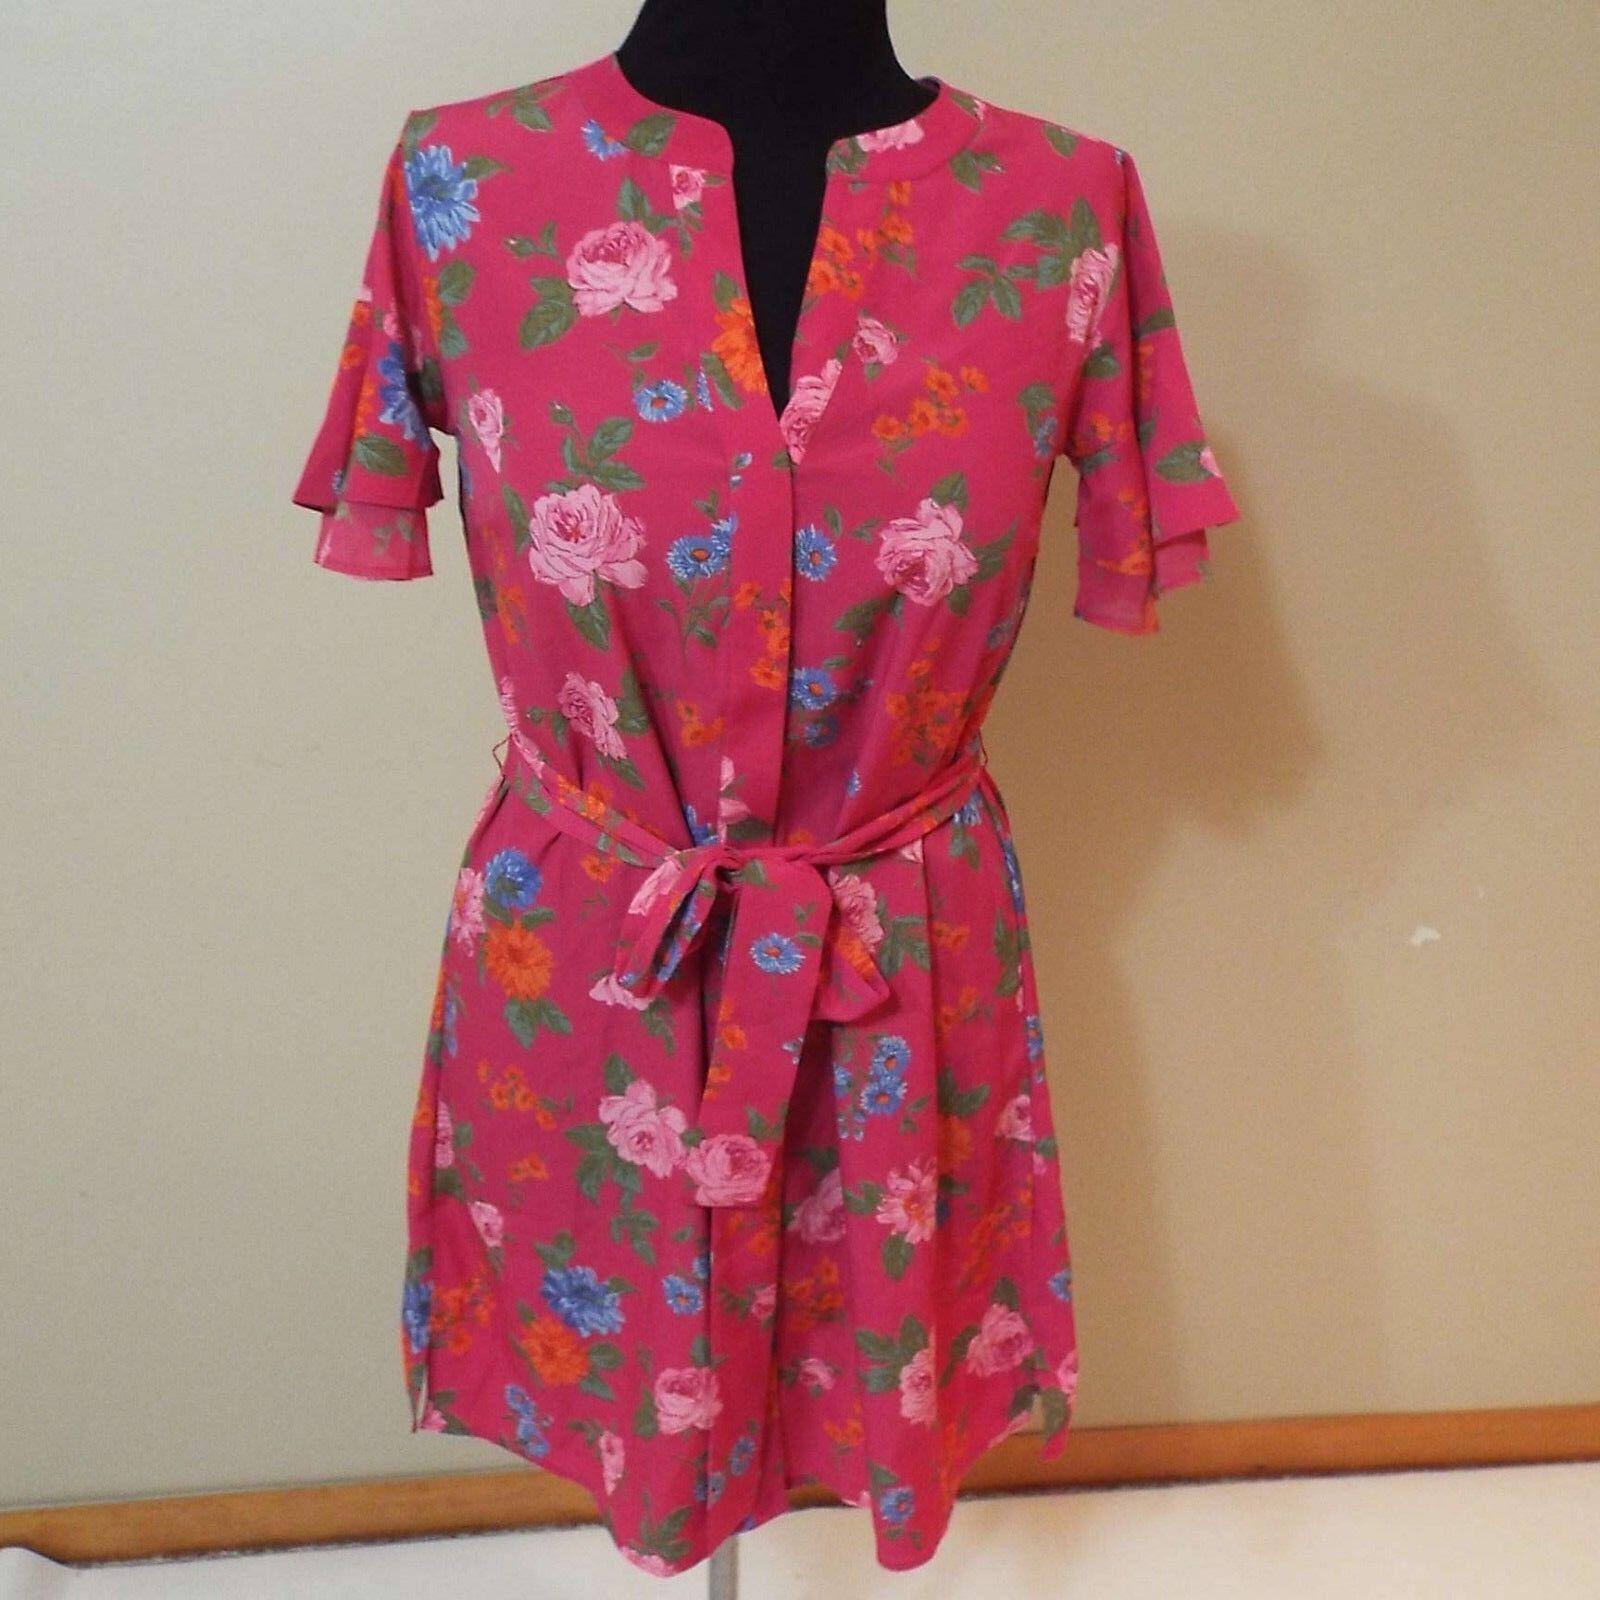 Ann Taylor pink flower print dress NWT size xs free shipping